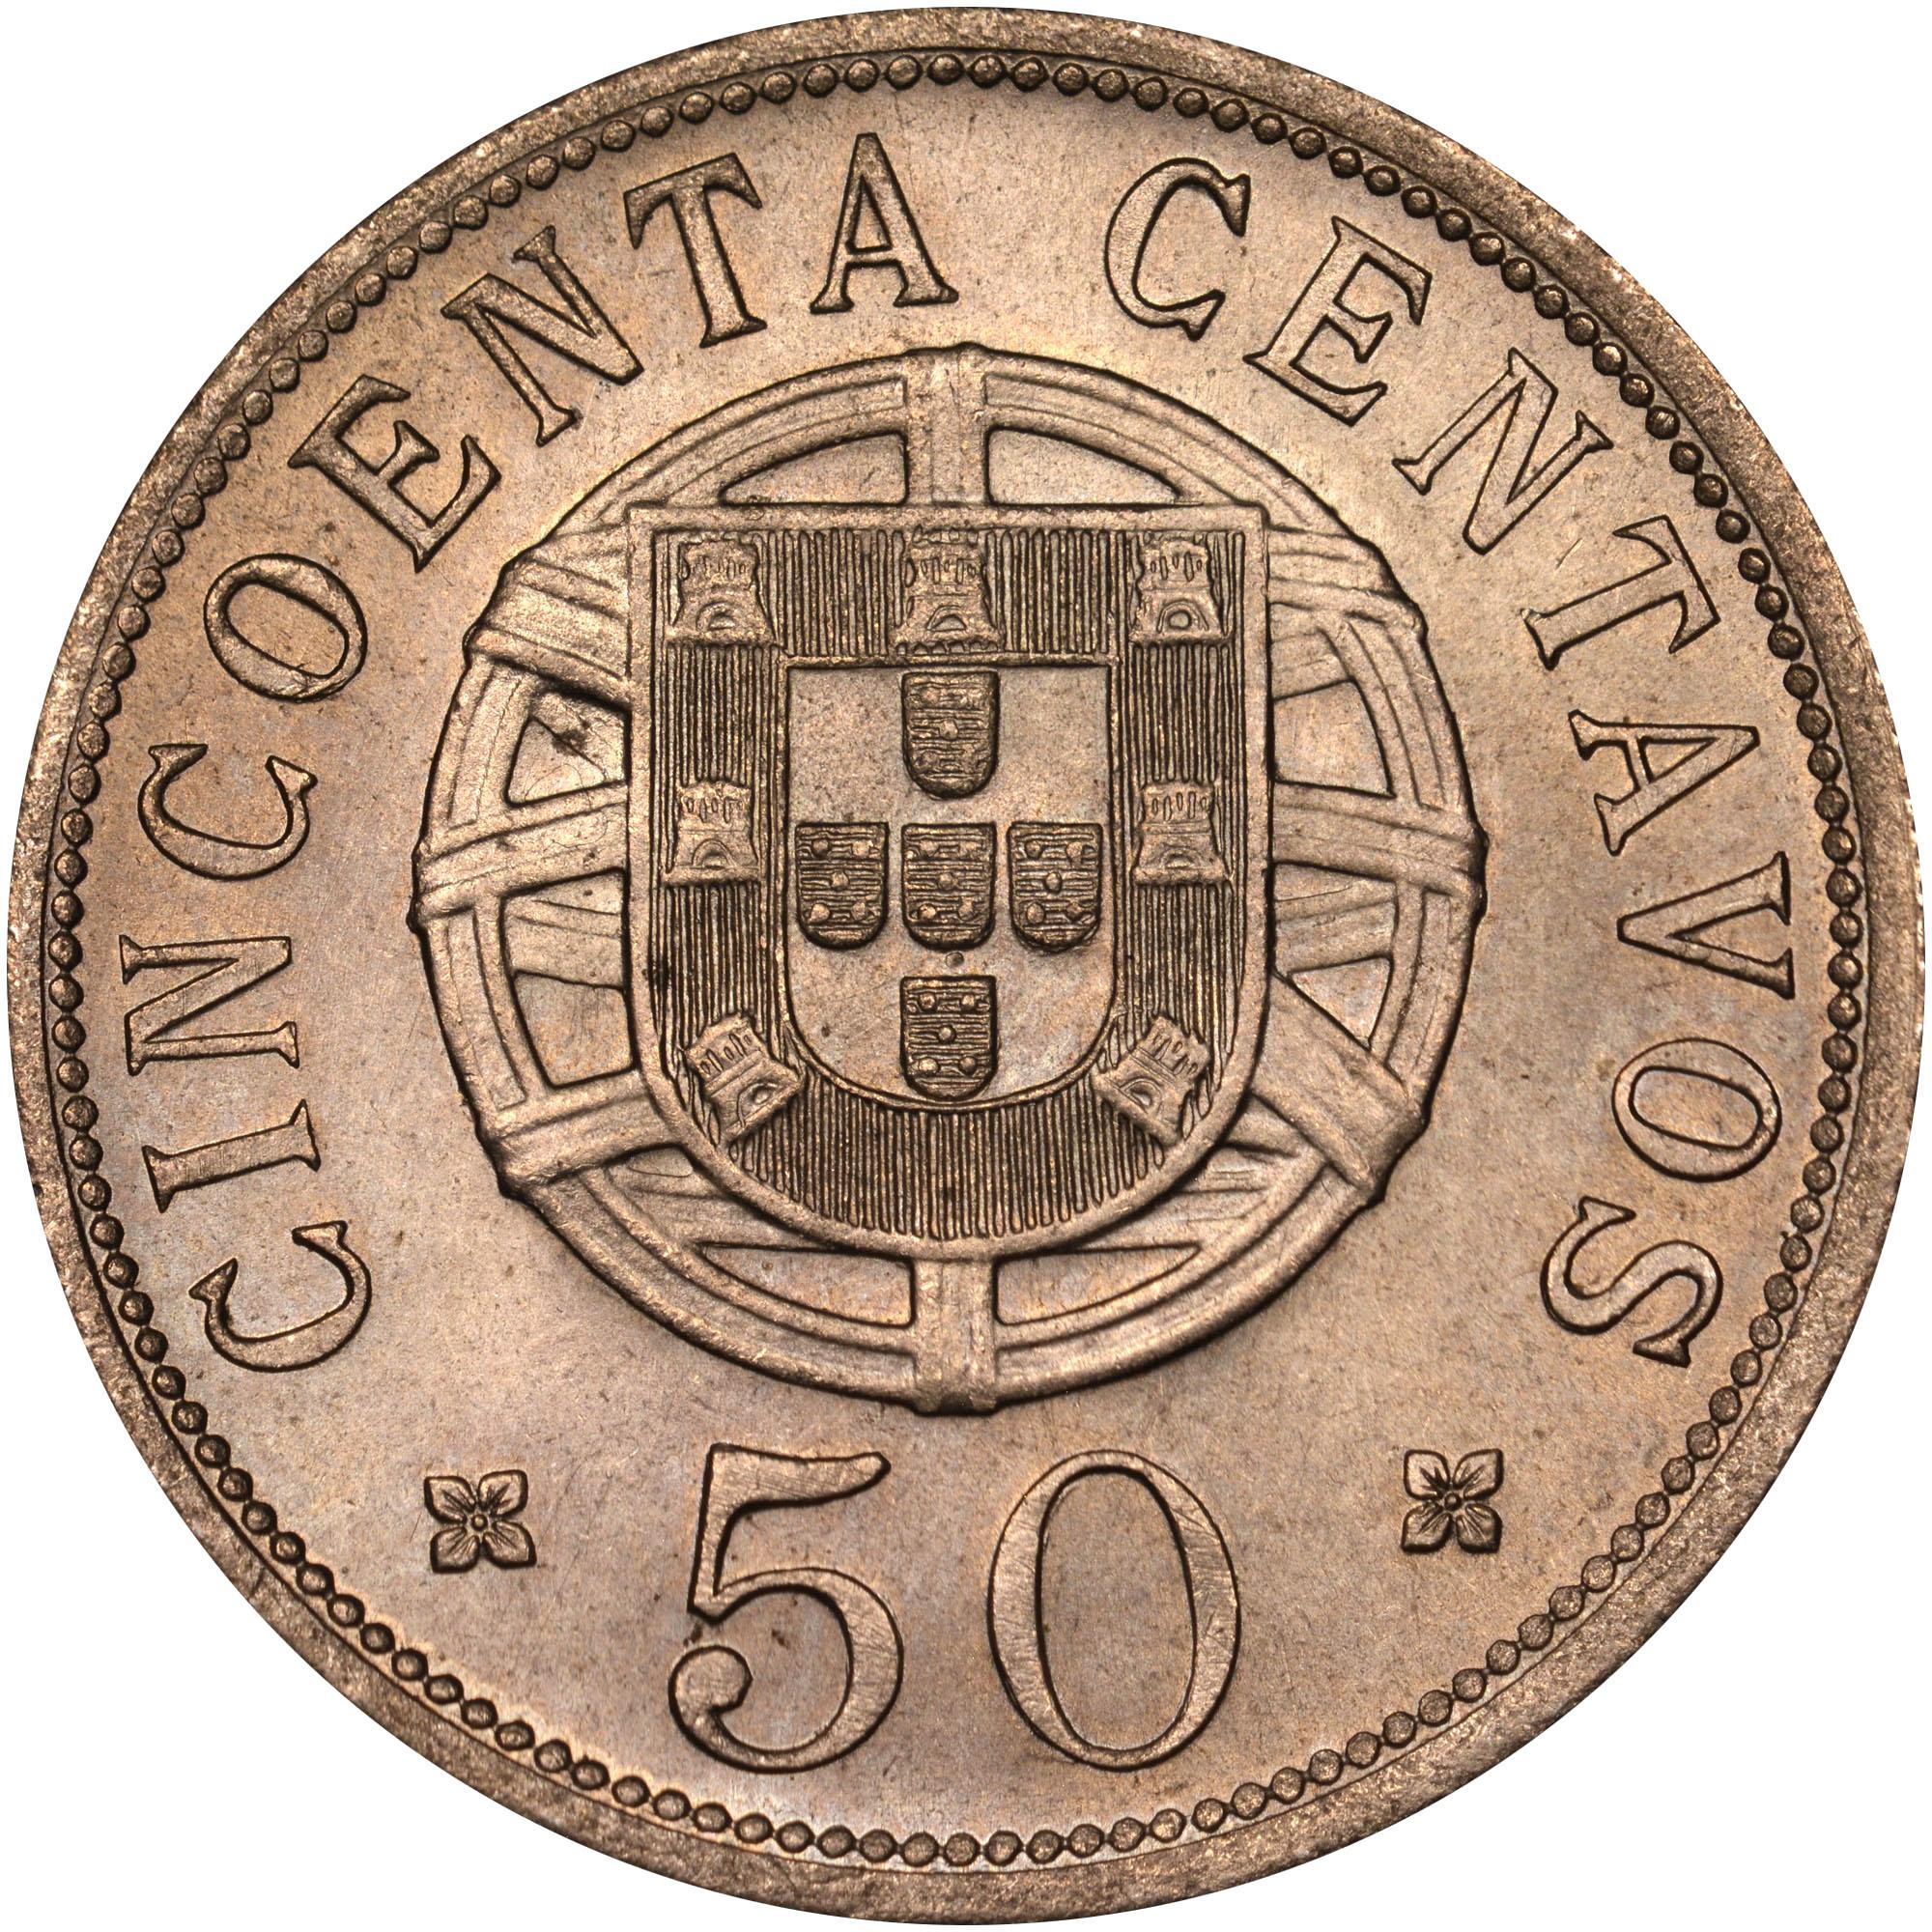 1927-1928/7 Angola 50 Centavos reverse